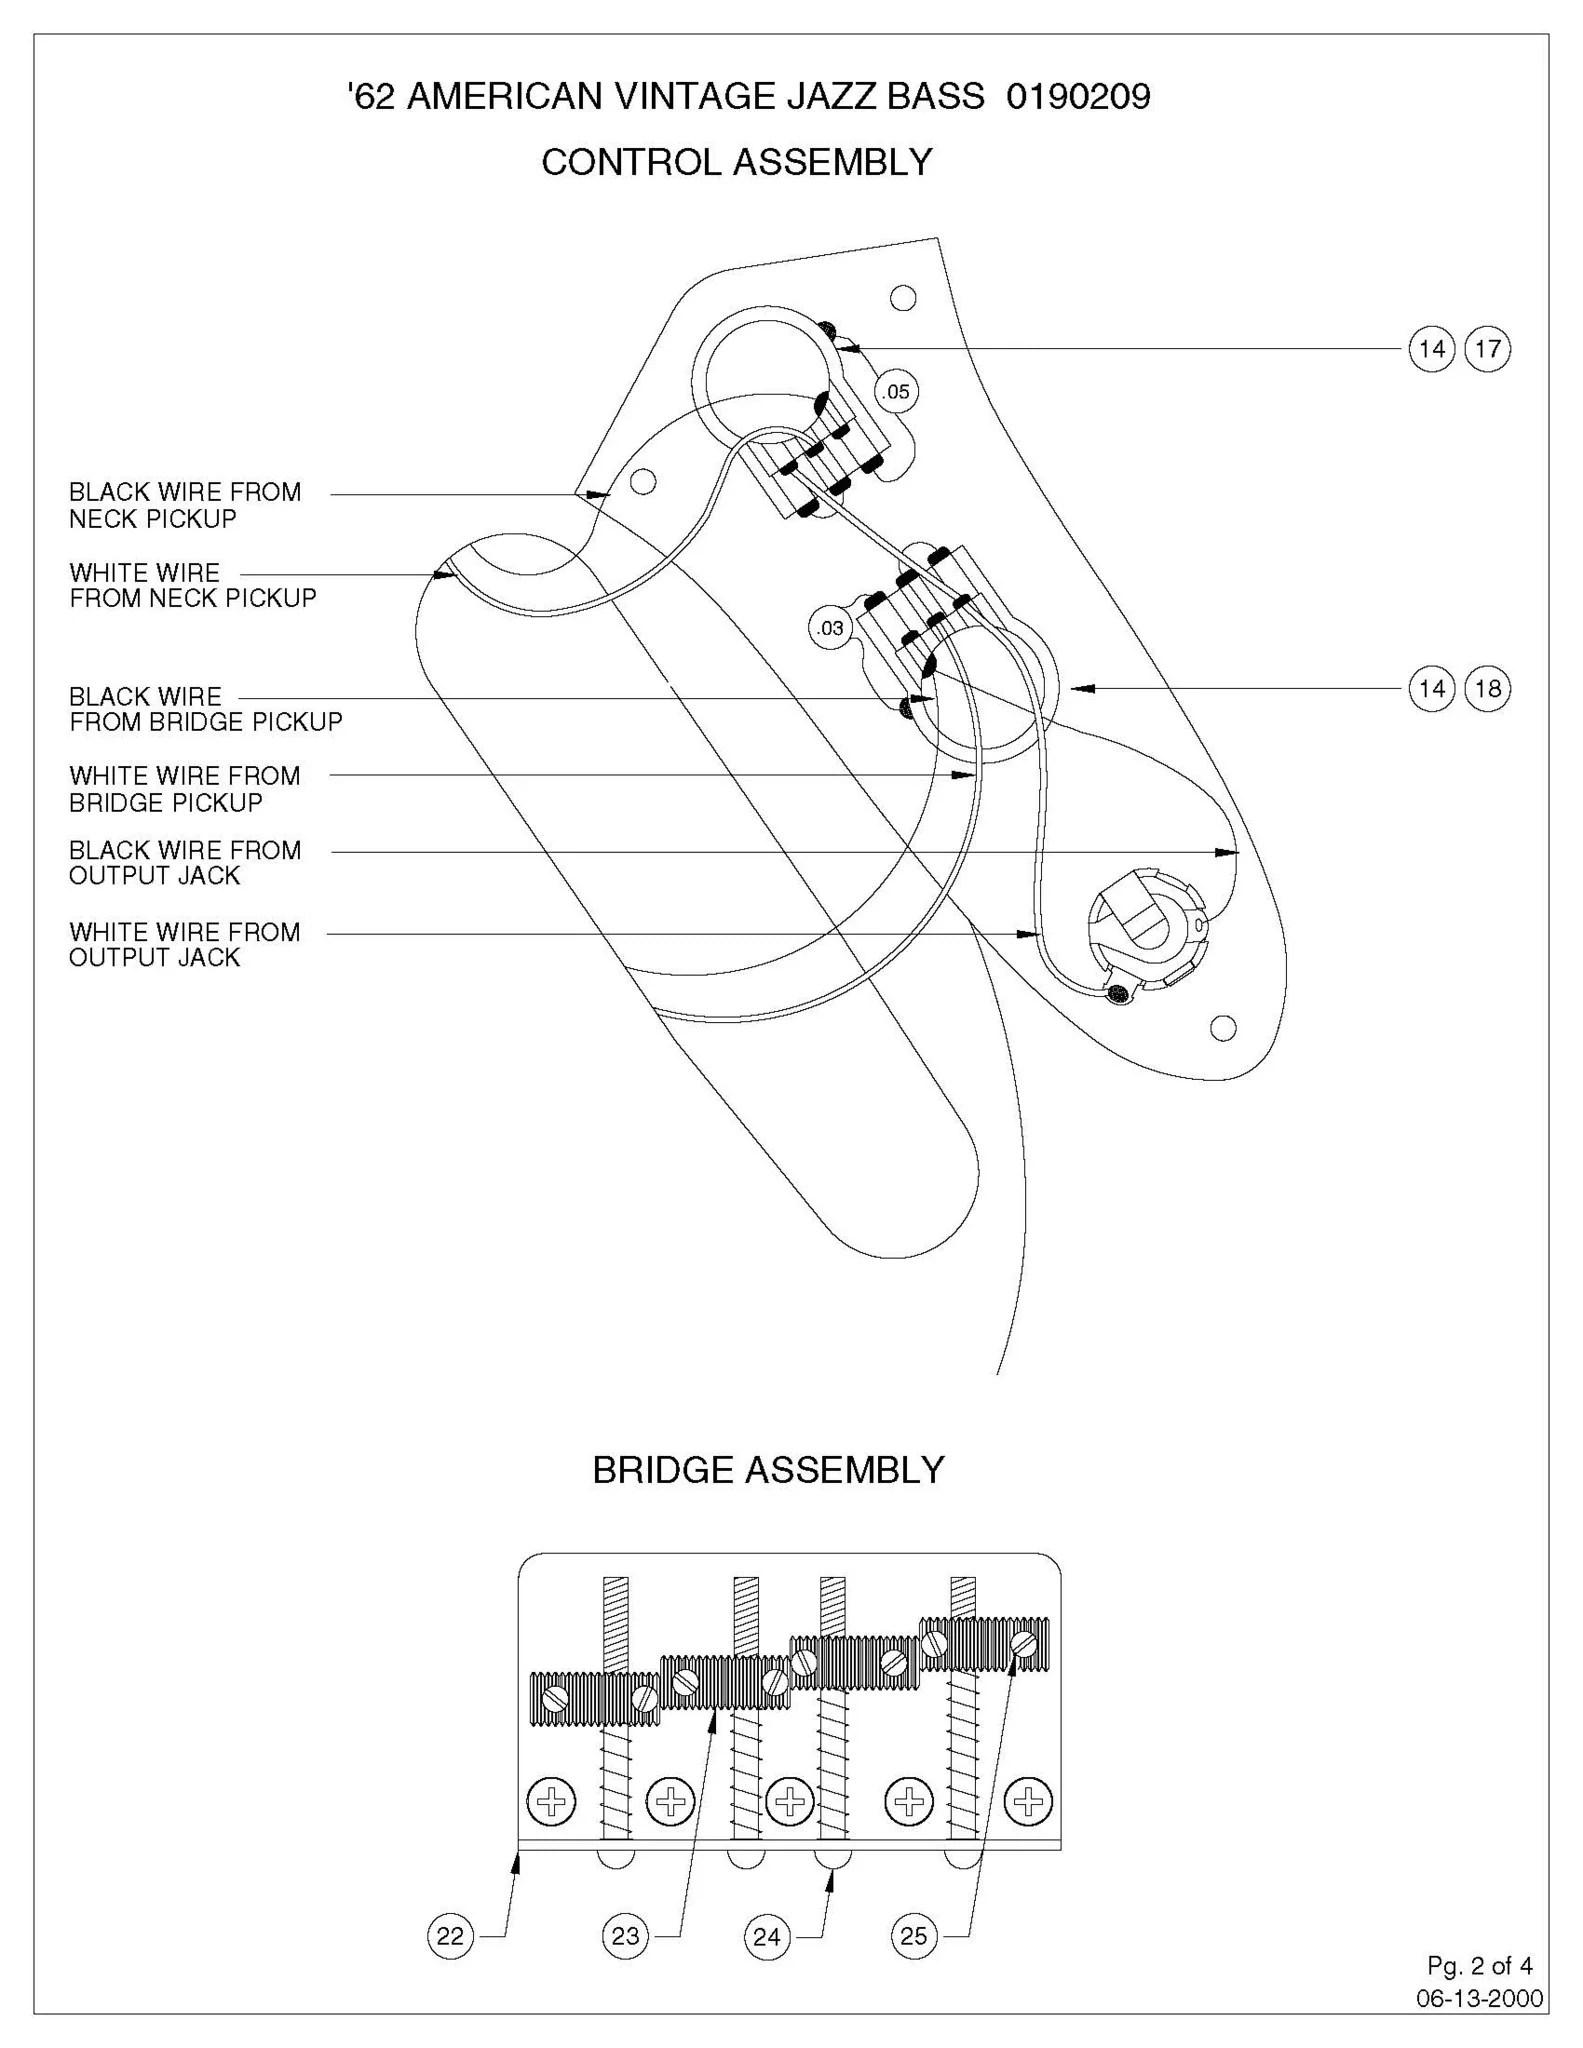 profax k115 micro switch wiring diagram